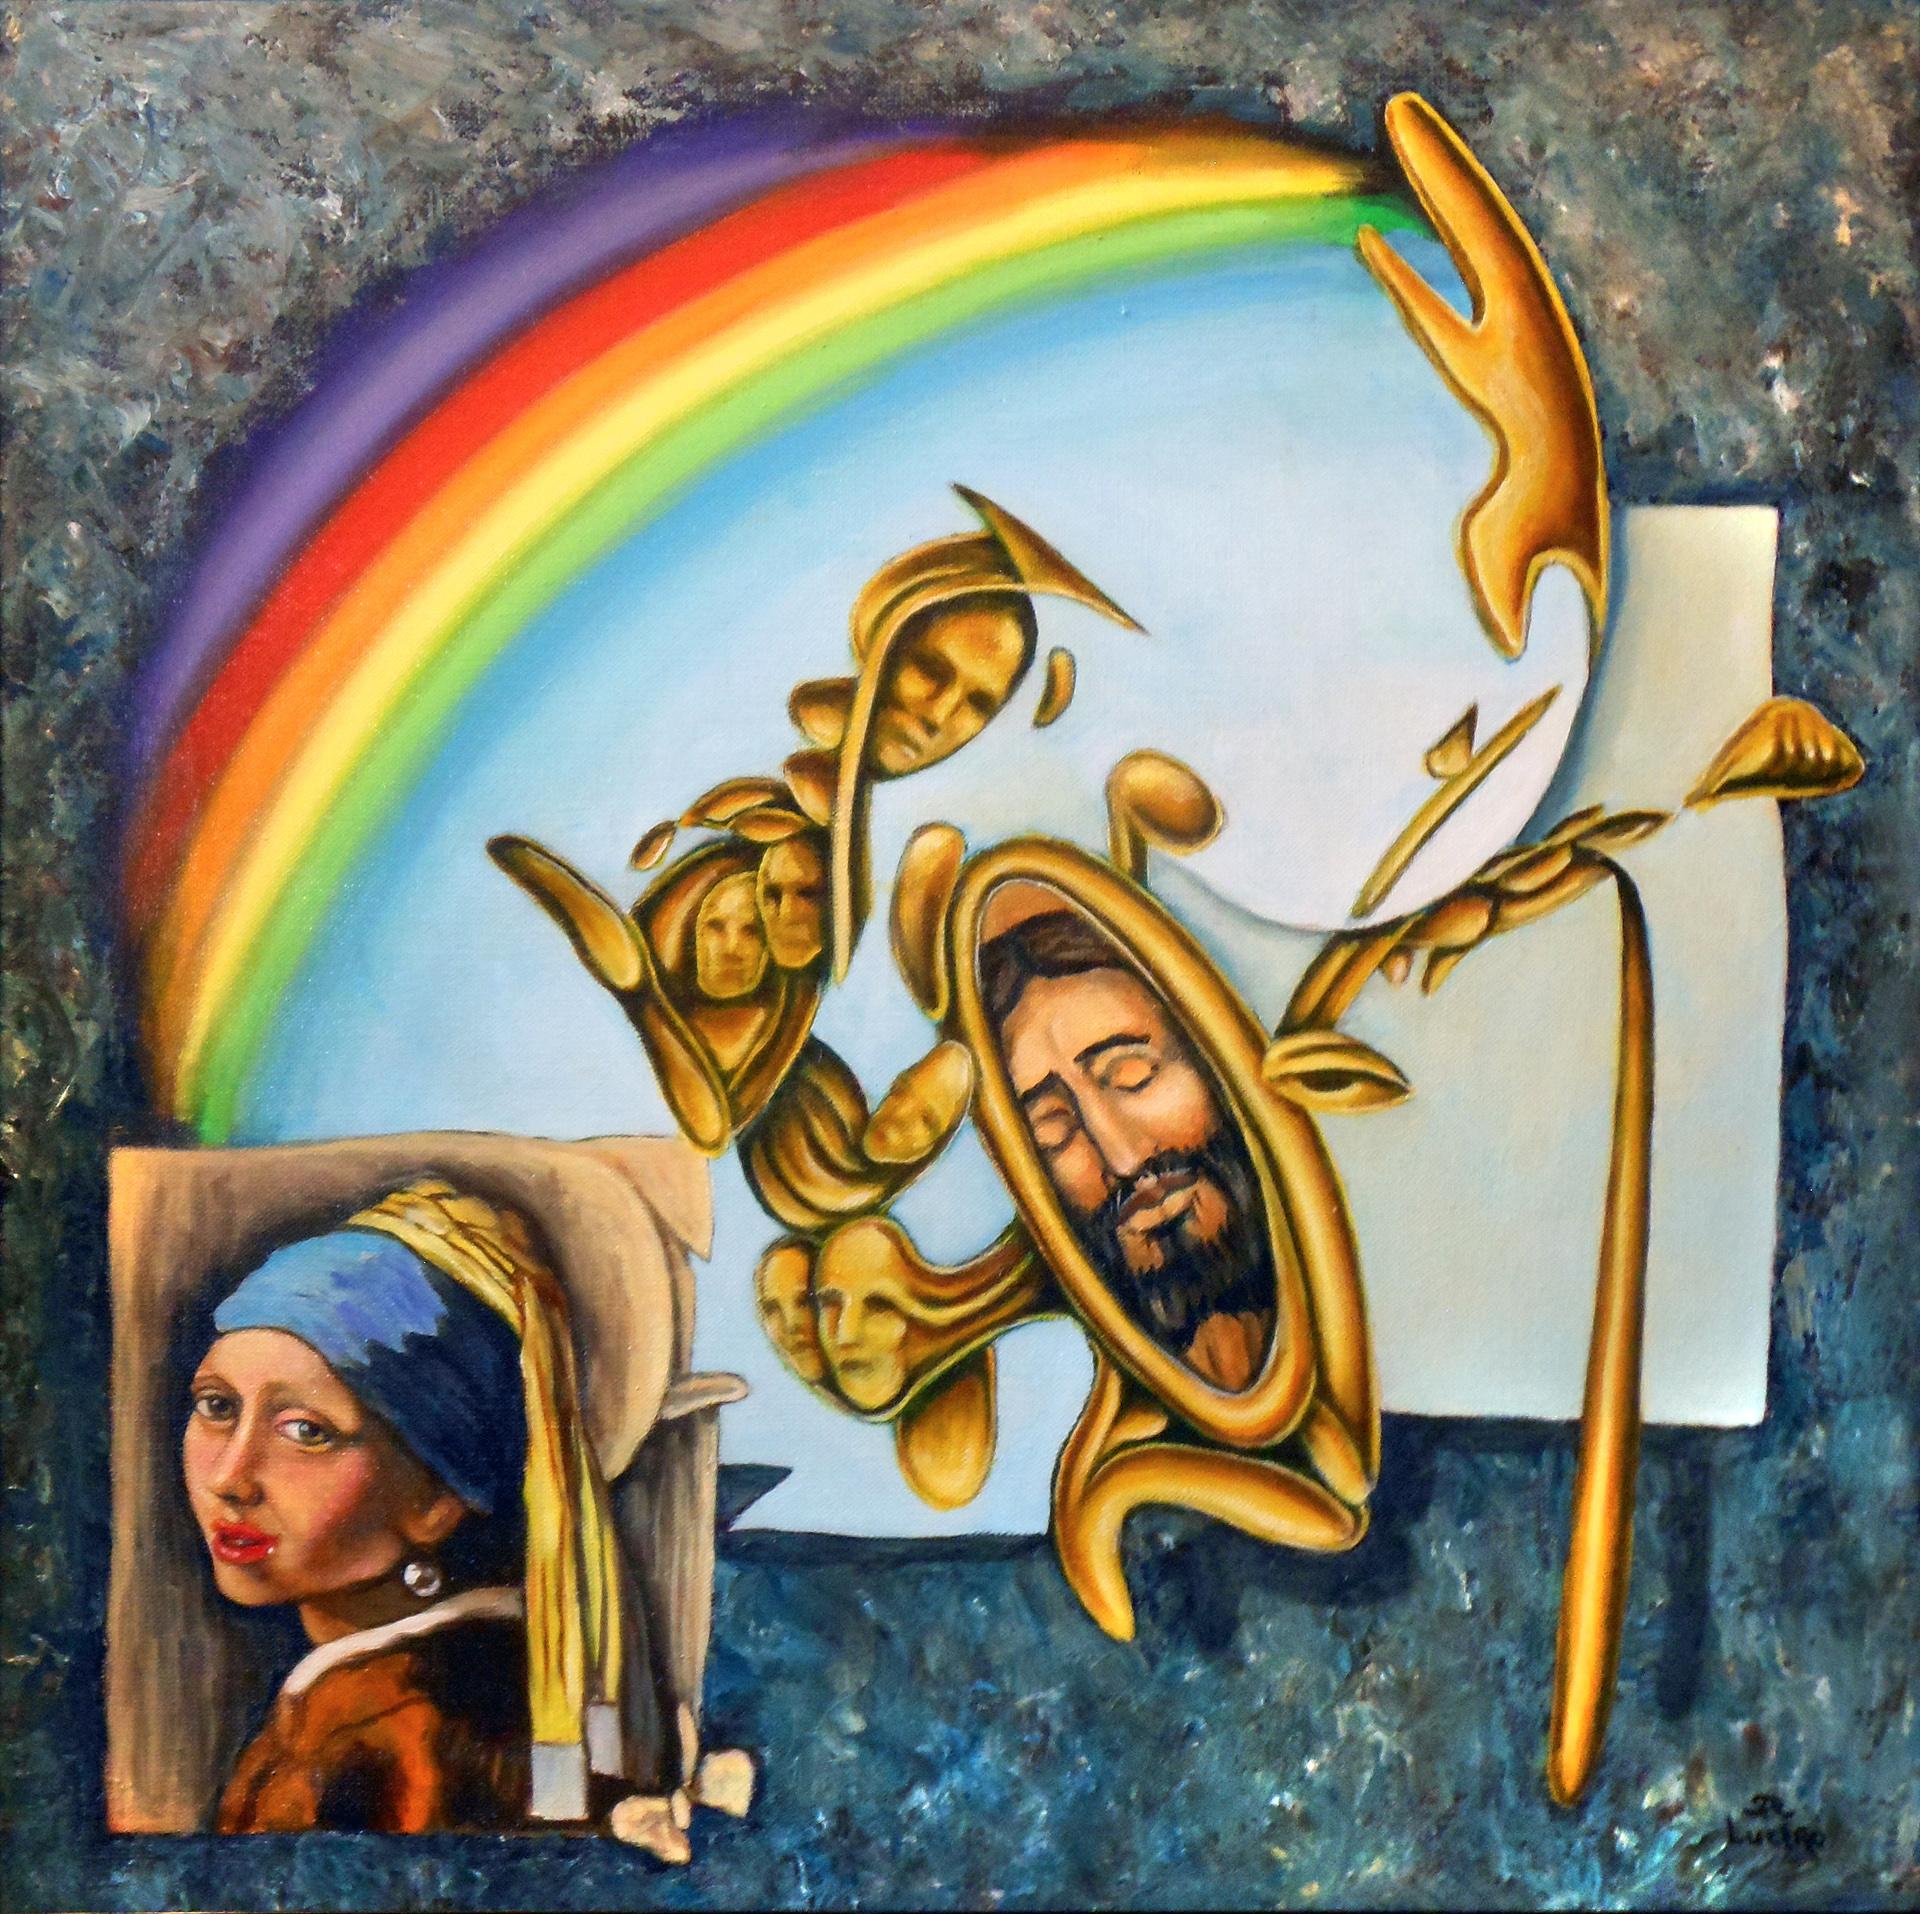 Rainbow Messiah